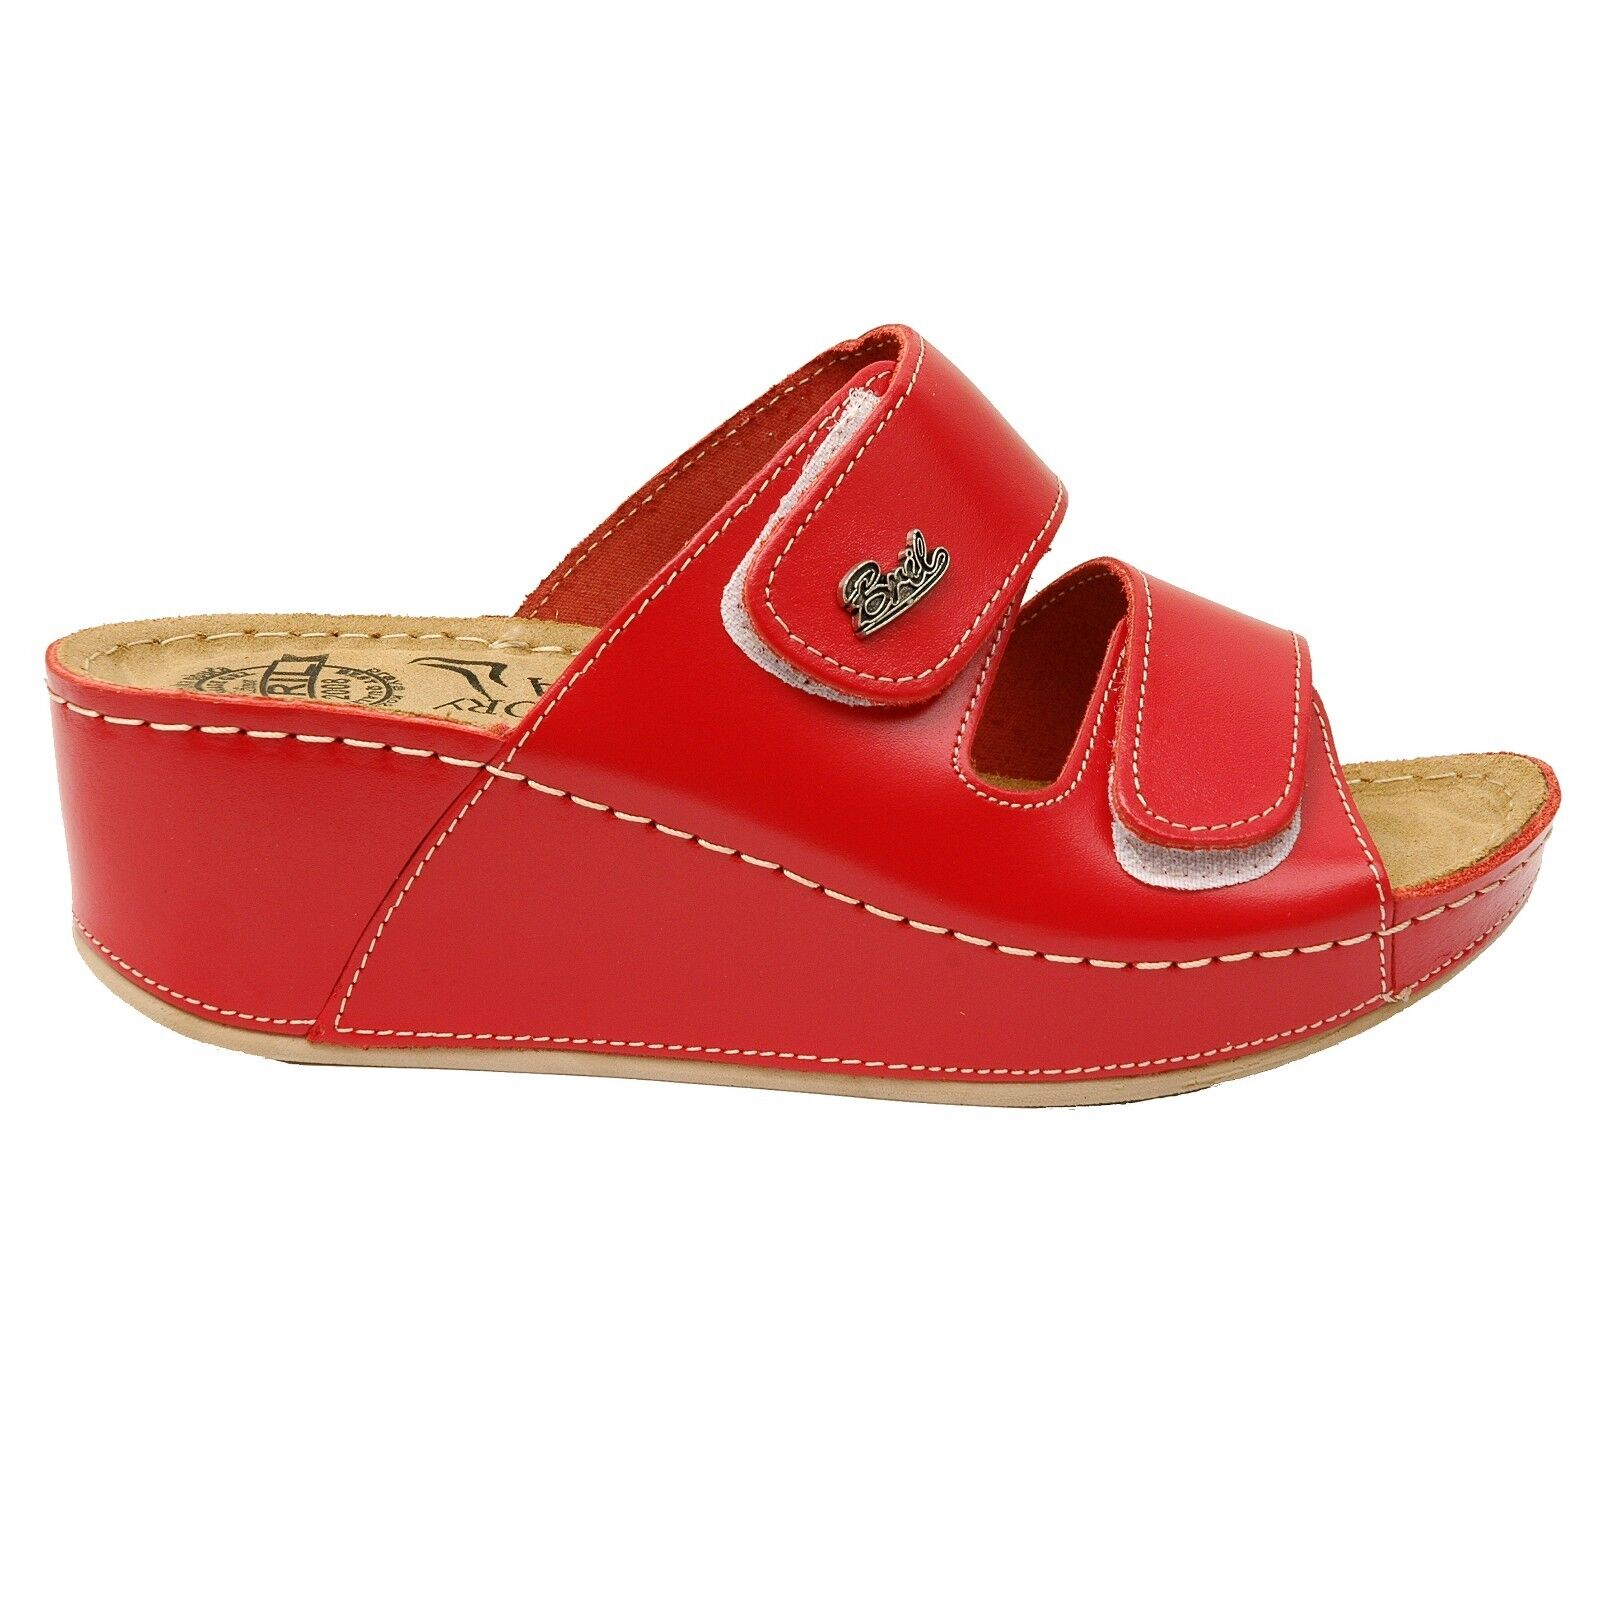 Dr Punto Damens Rosso BRIL D112 Damens Punto Leder Slip On Sandale Clogs Mules Slippers, ROT e8b3eb